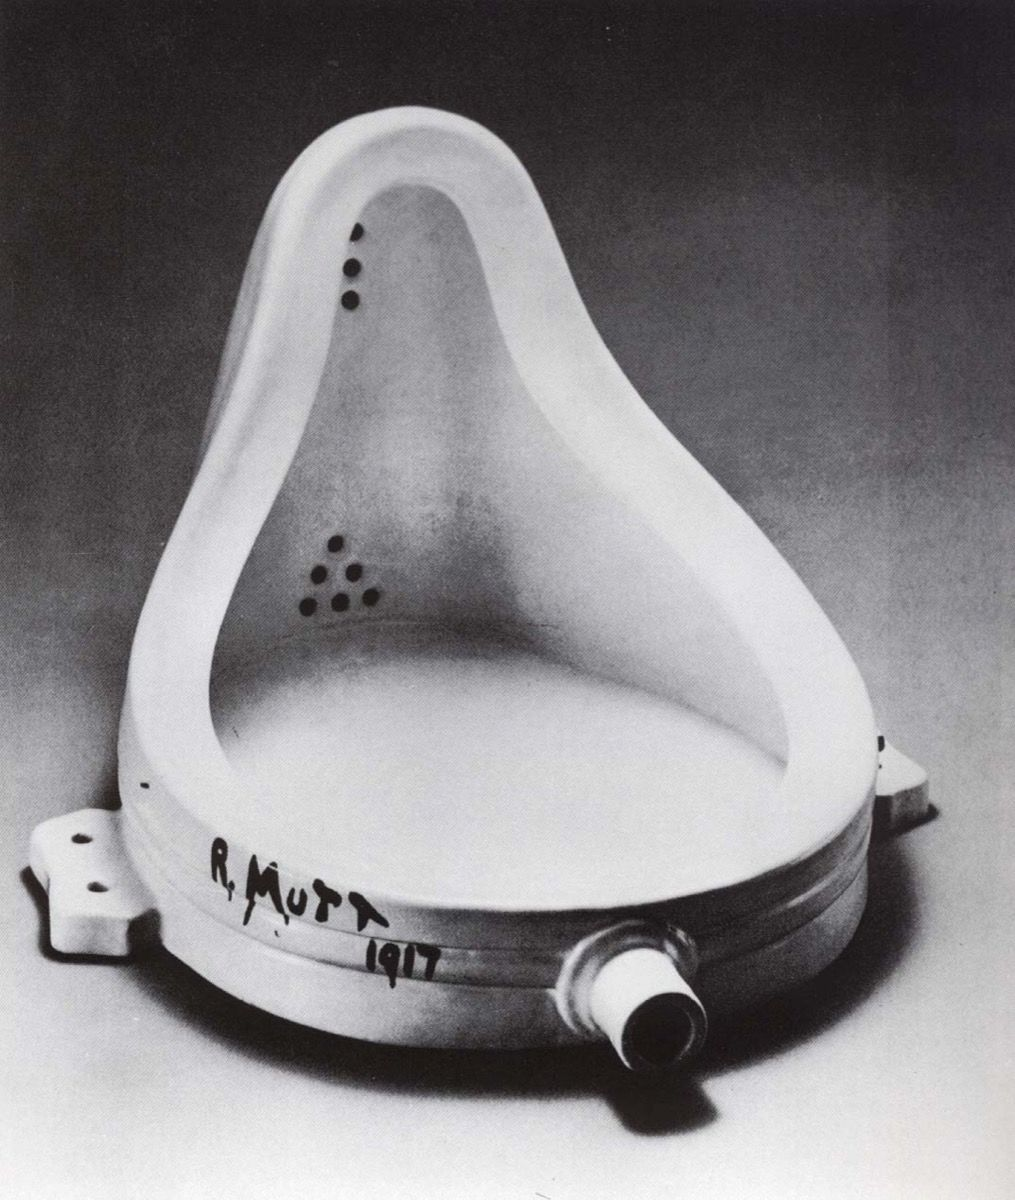 Marcel Duchamp's